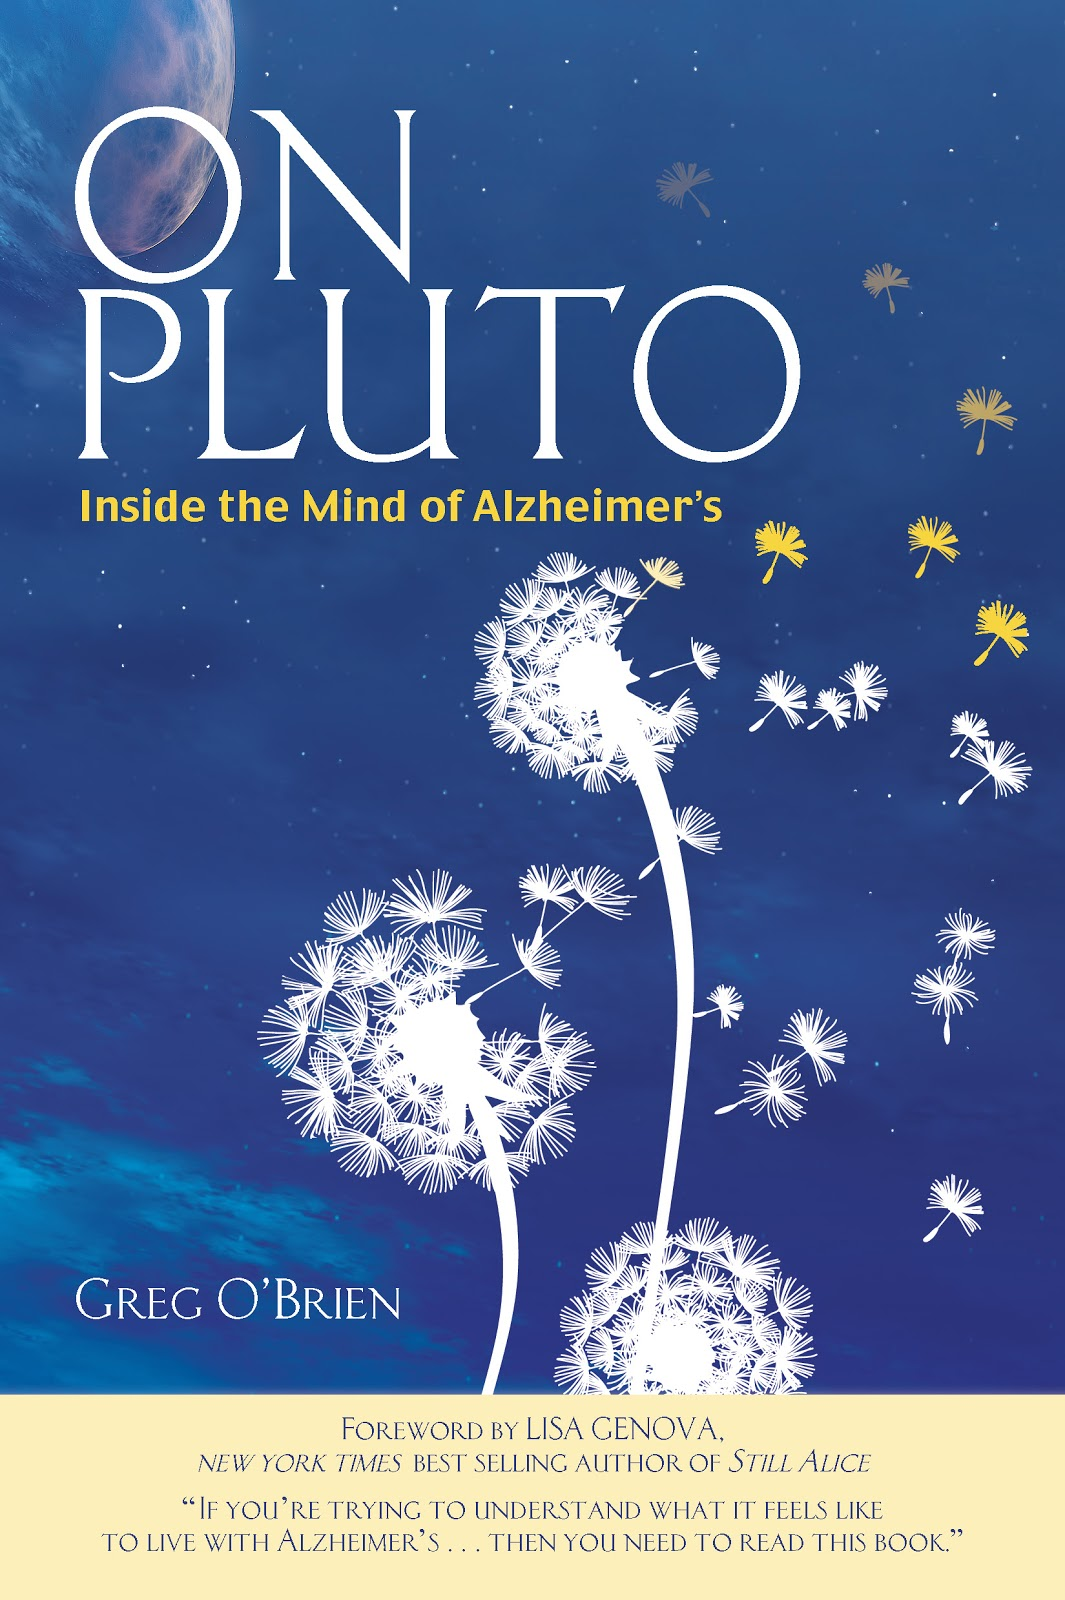 Pluto_cover.jpg